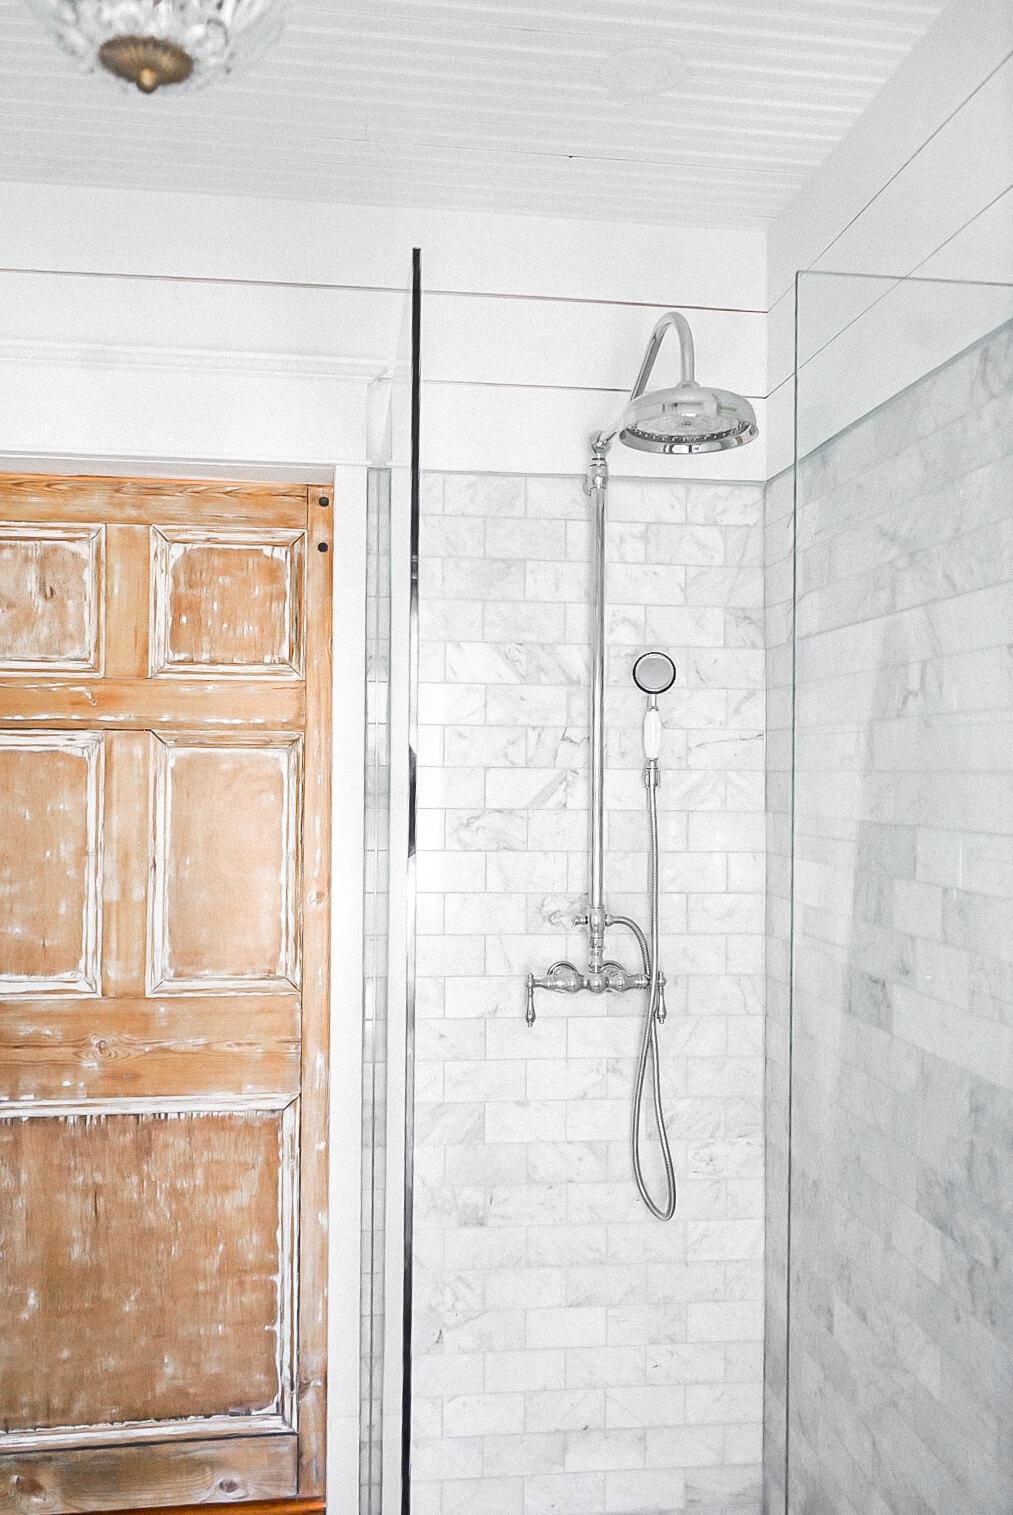 Bathroom polished chrome shower faucet